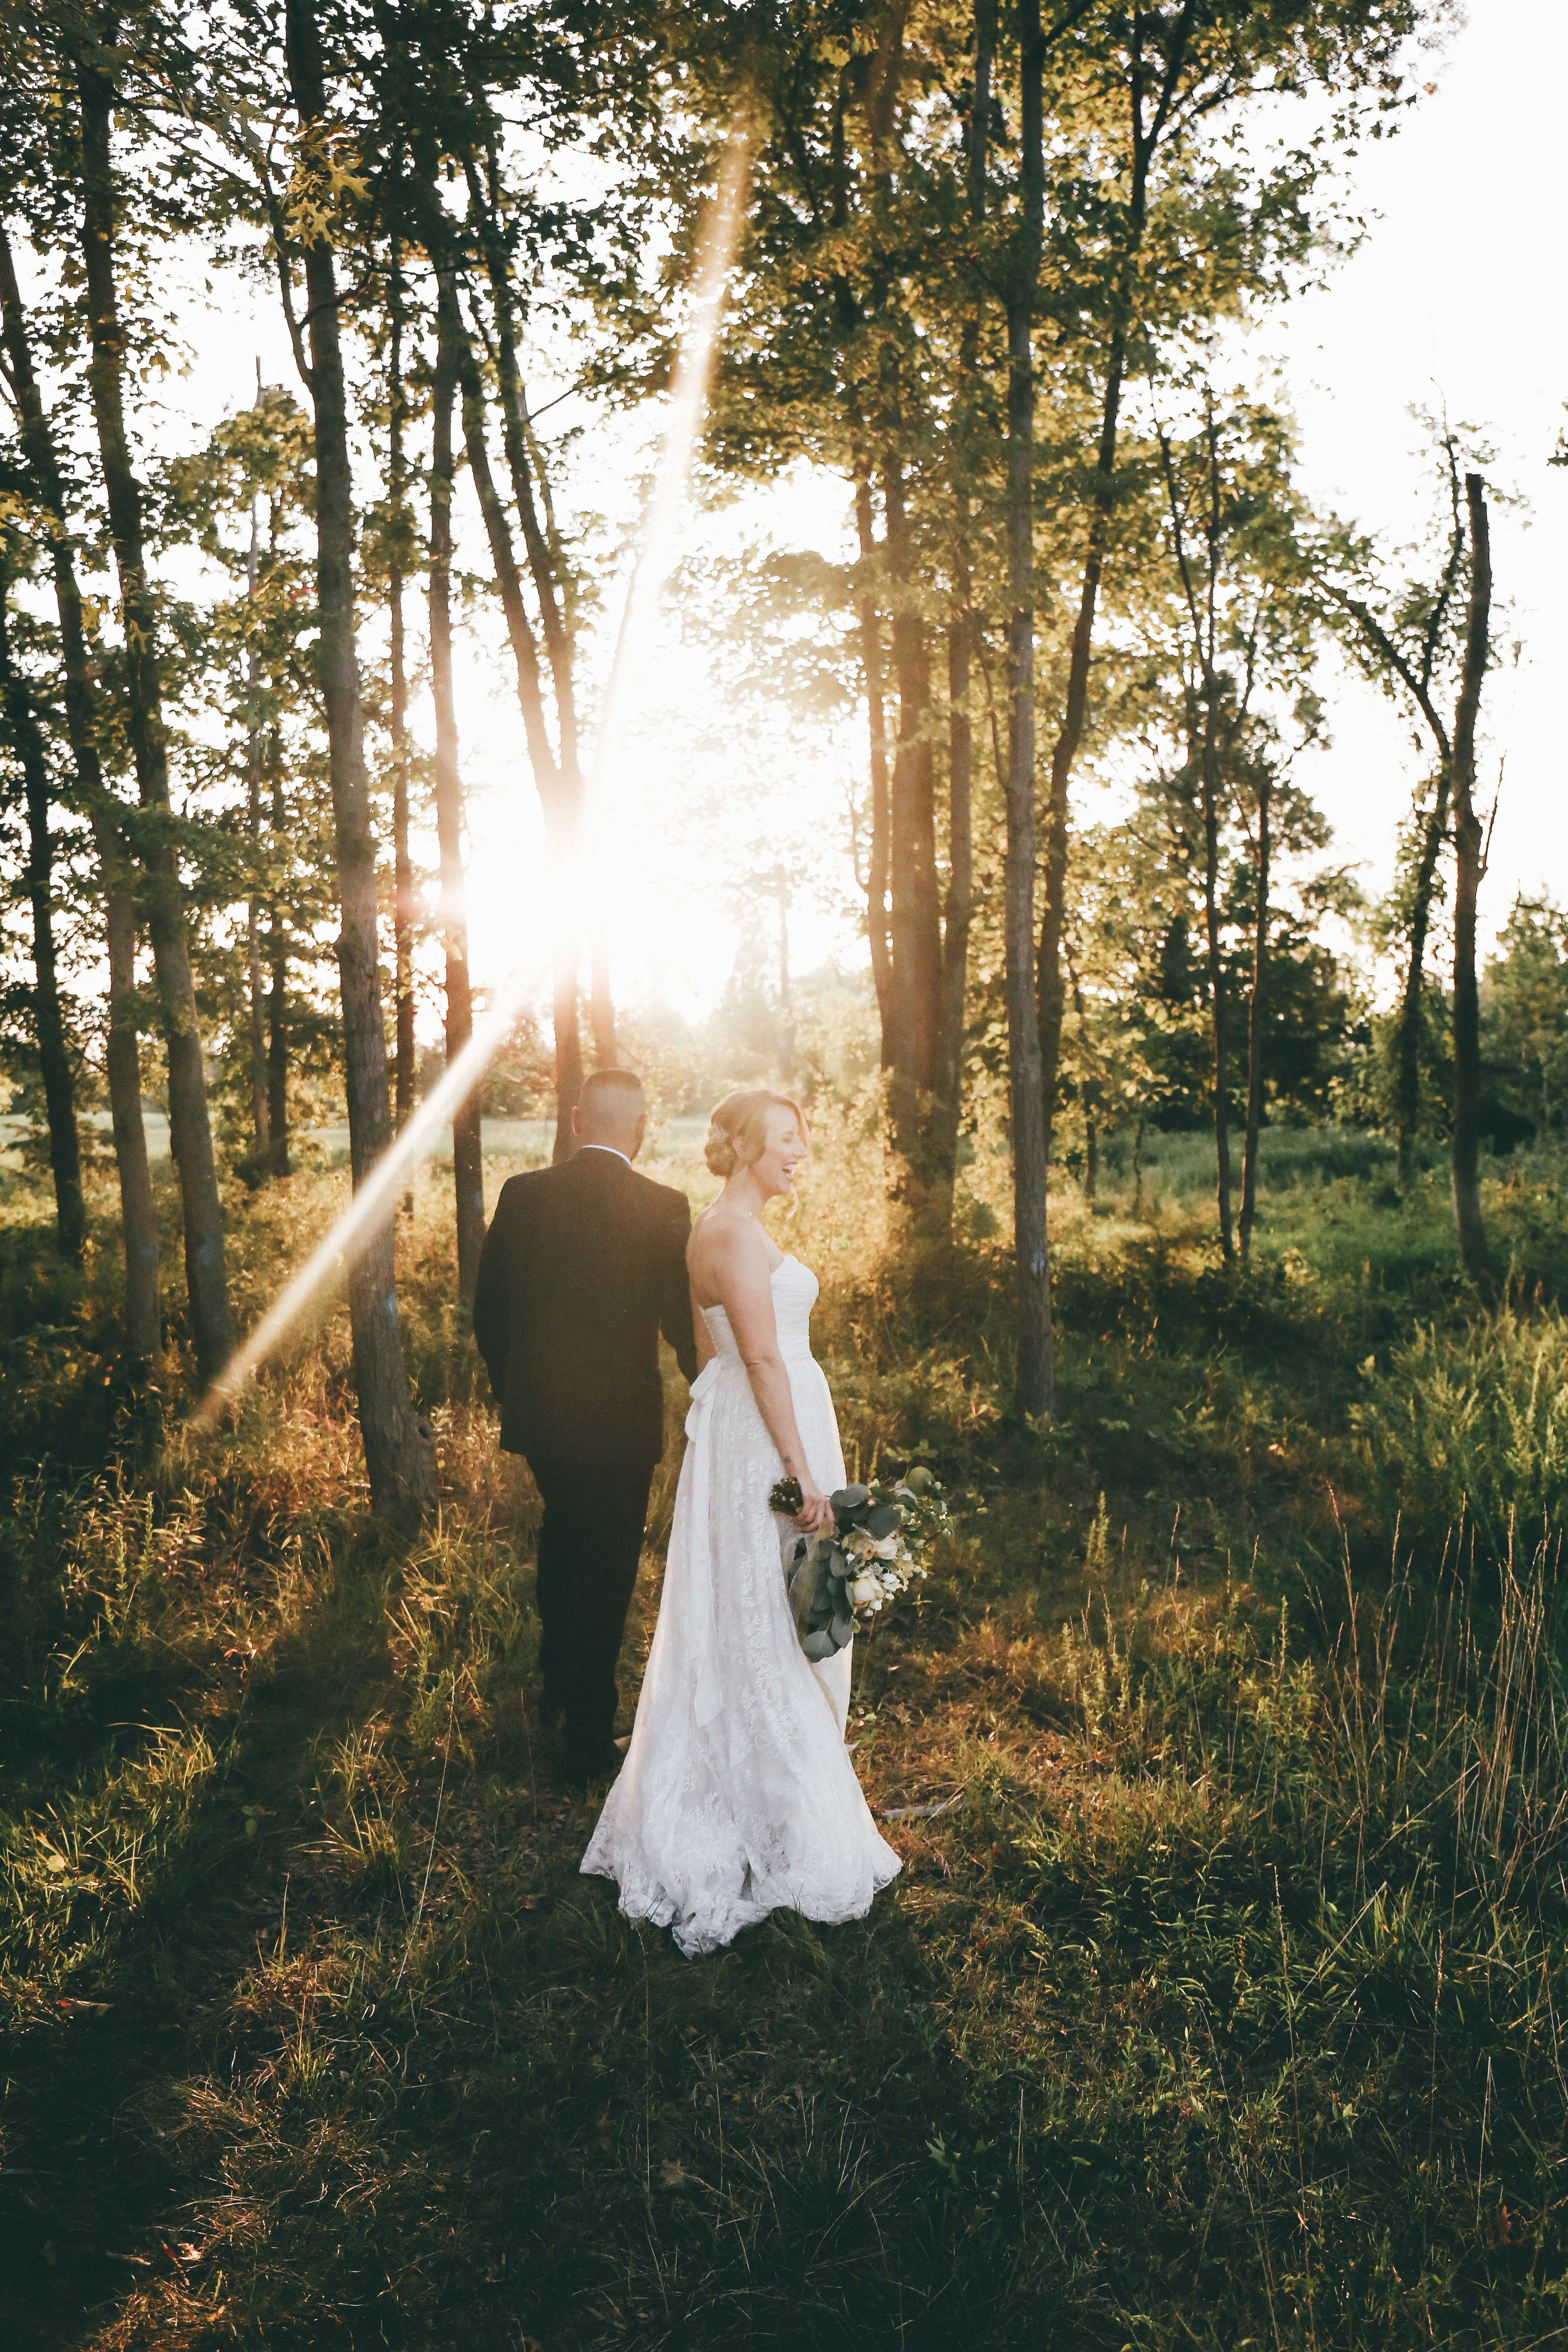 BaileyMena_Married - 405.jpg